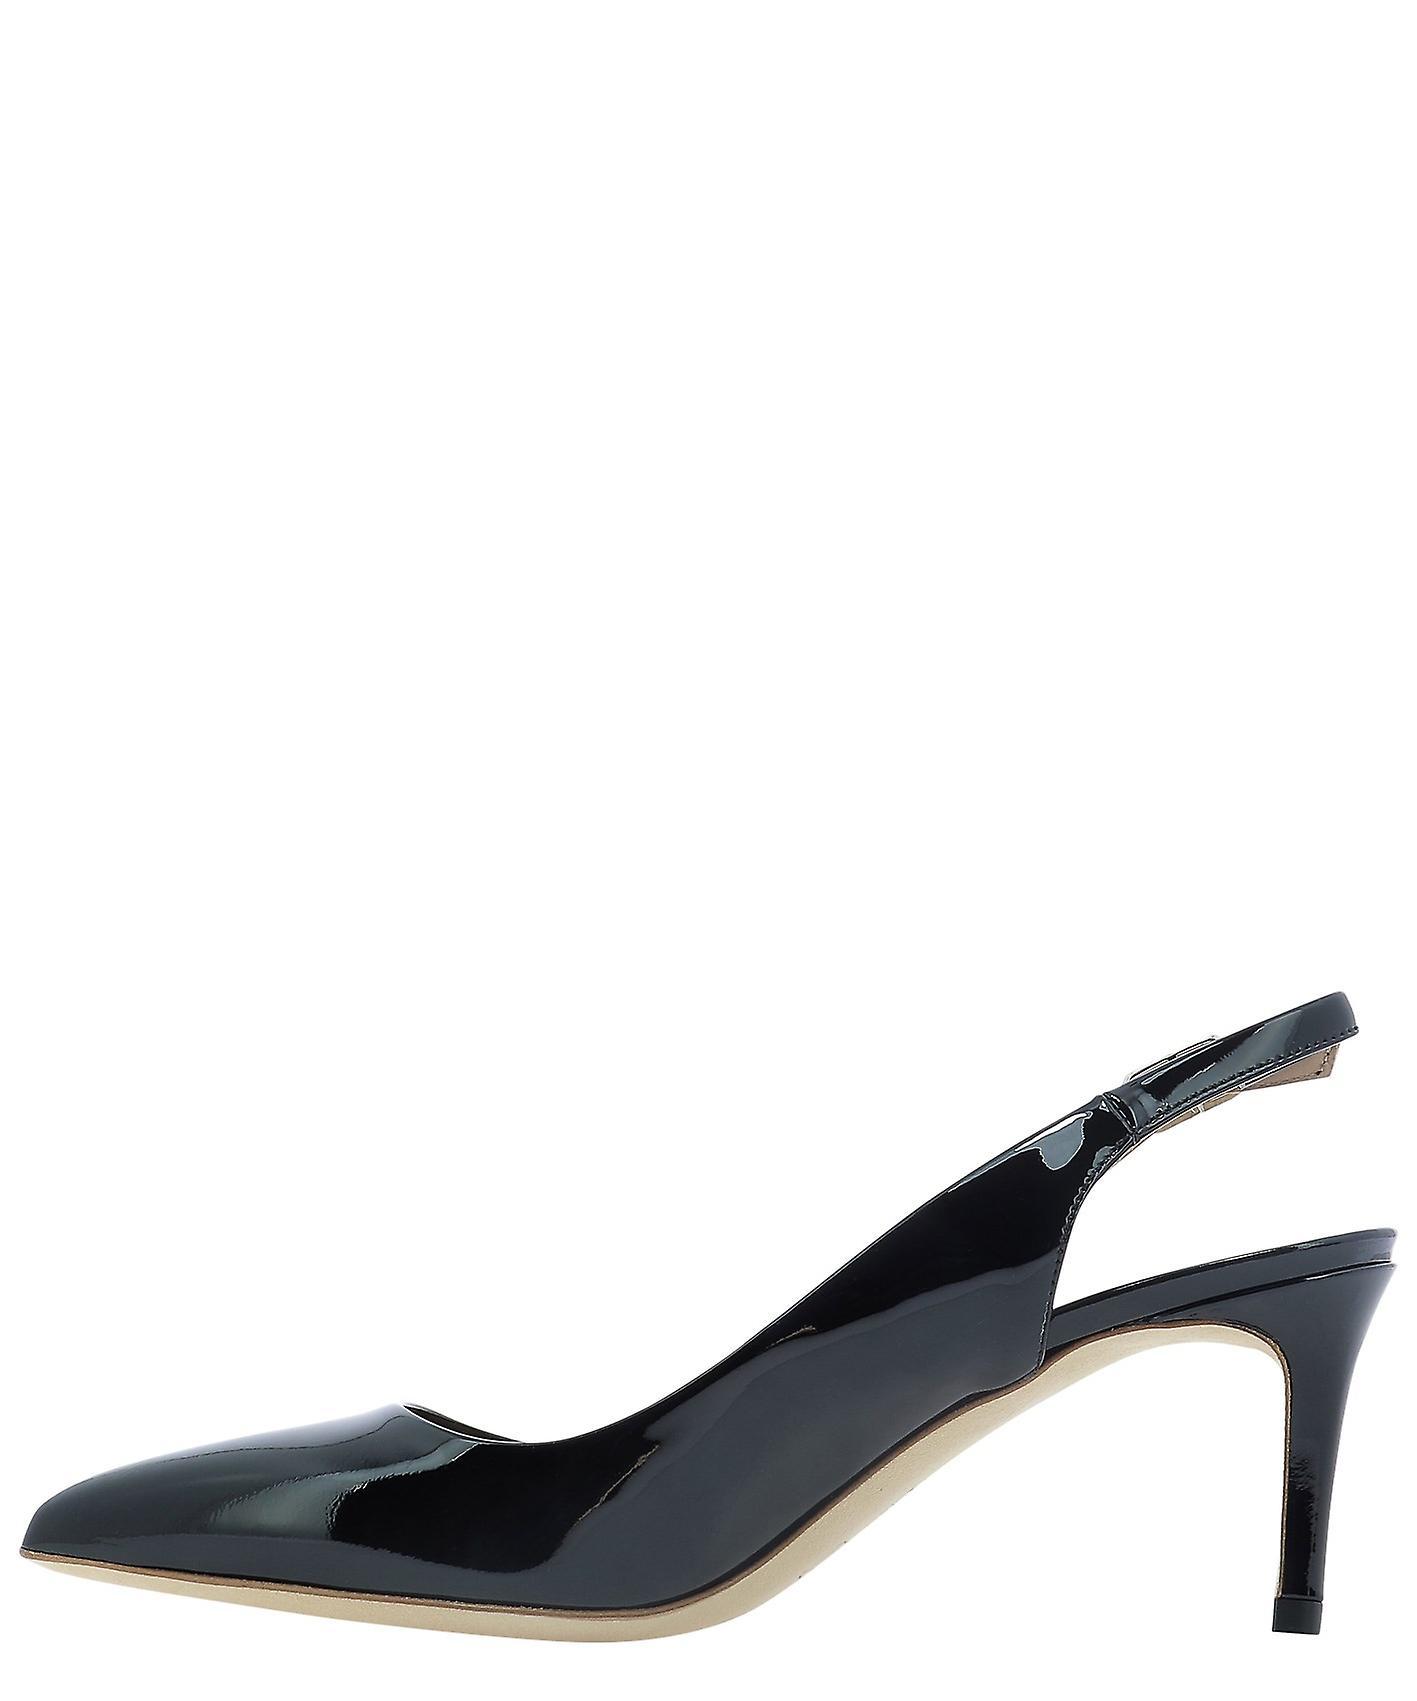 Sergio Levantesi Gemyvernicenero Women's Black Patent Leather Sandals